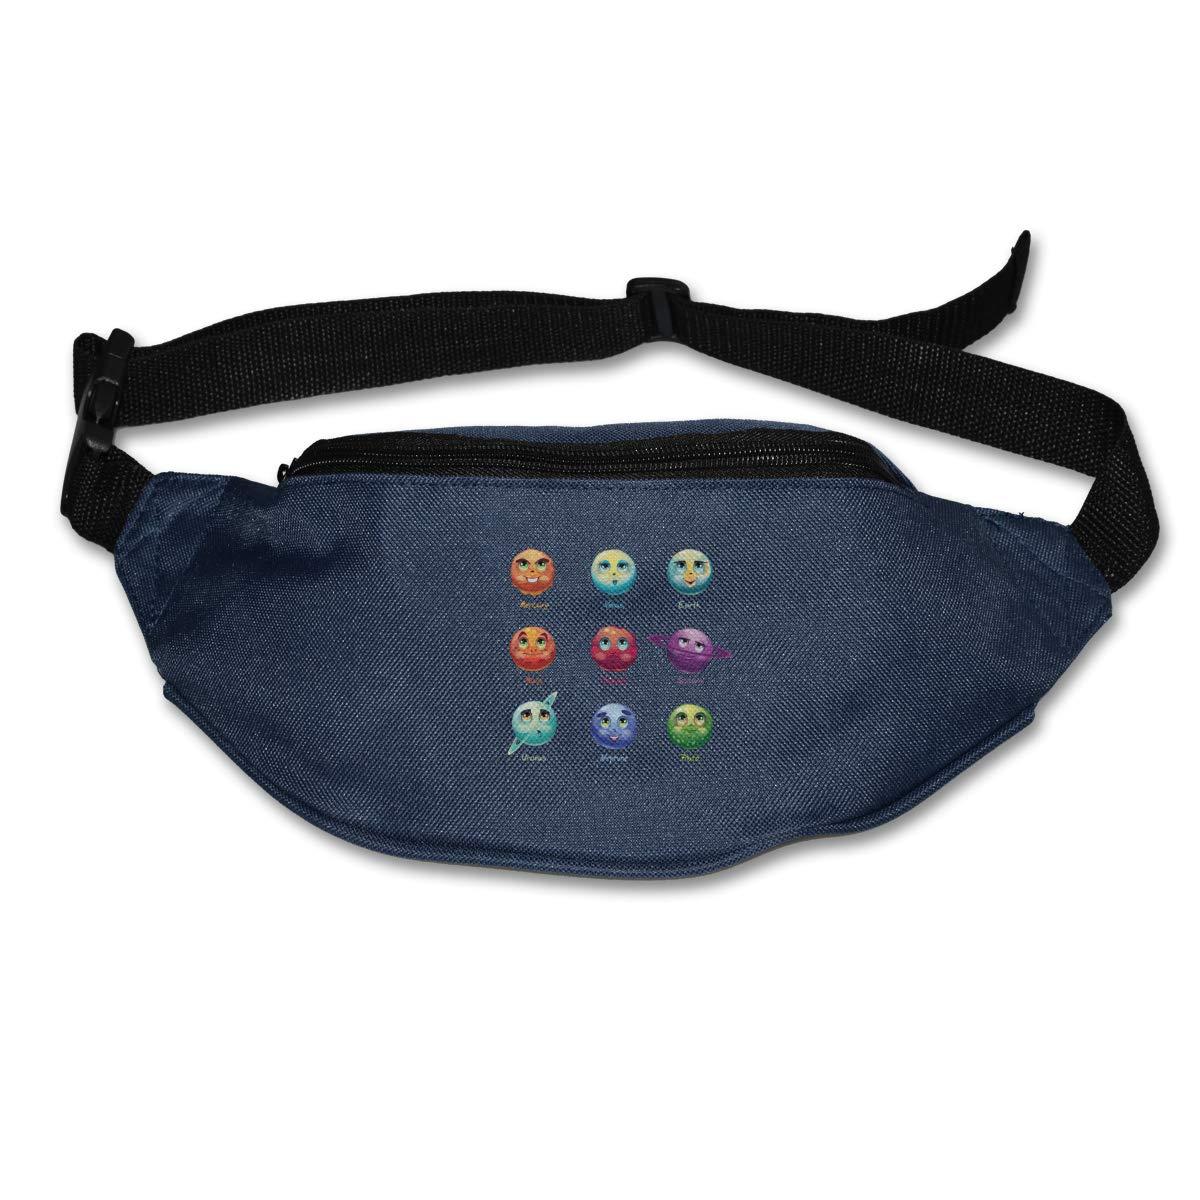 Planets System Sport Waist Packs Fanny Pack Adjustable For Travel